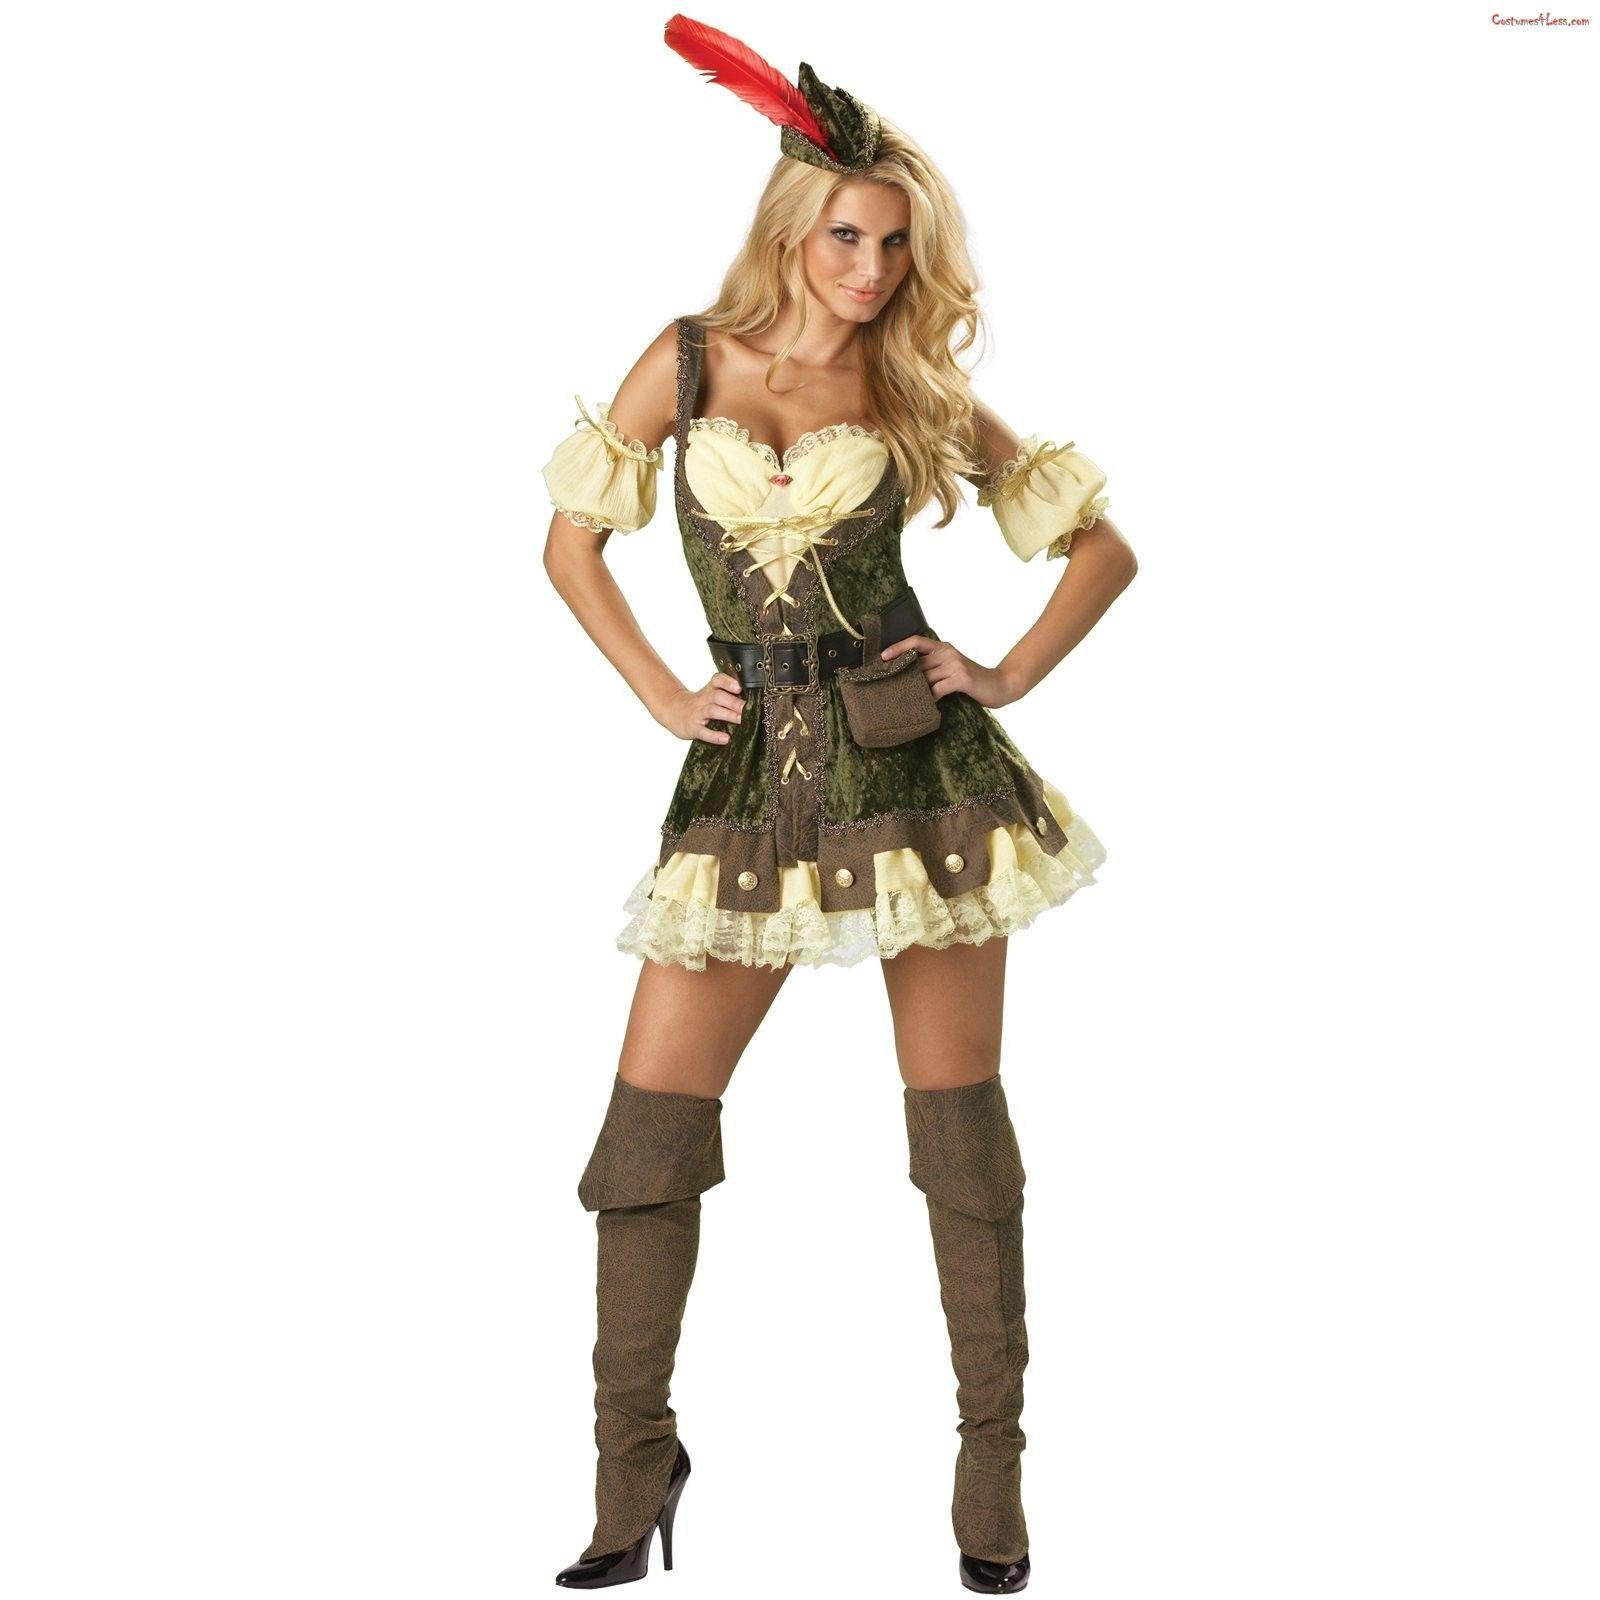 Adult dating robin hood kostüm